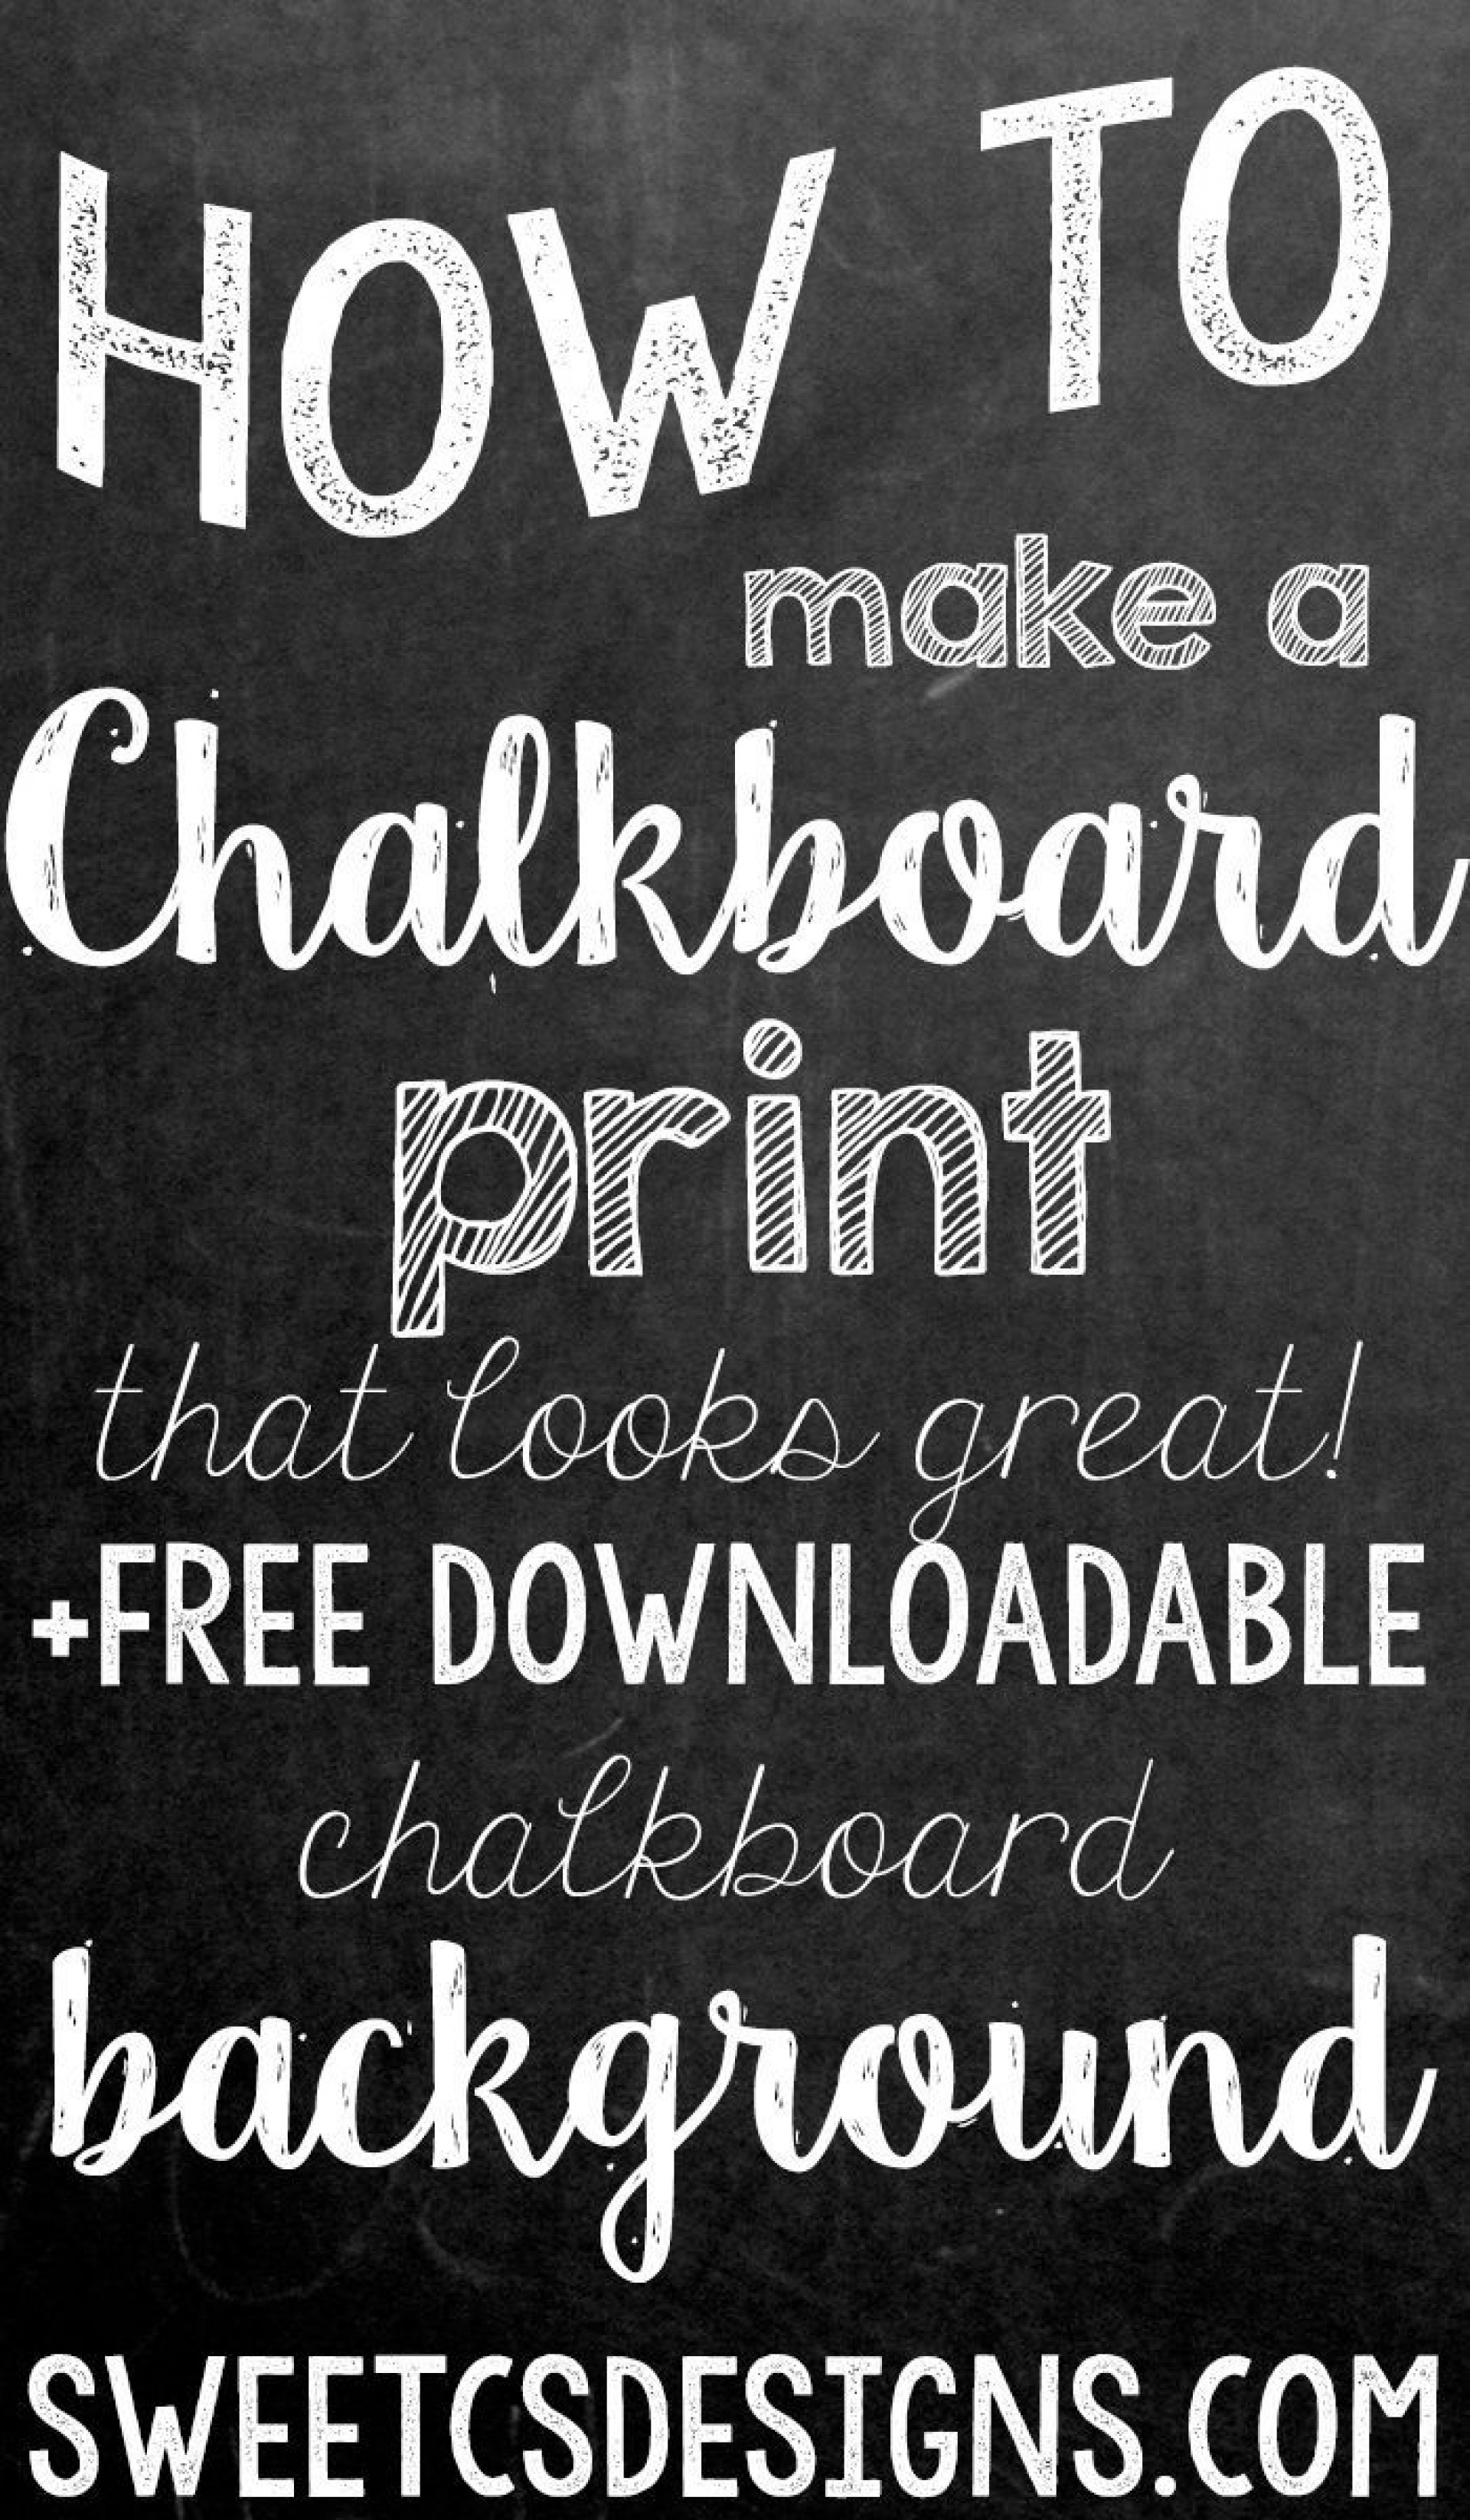 000 Beautiful Chalkboard Template Microsoft Word Example  Editable Menu1920